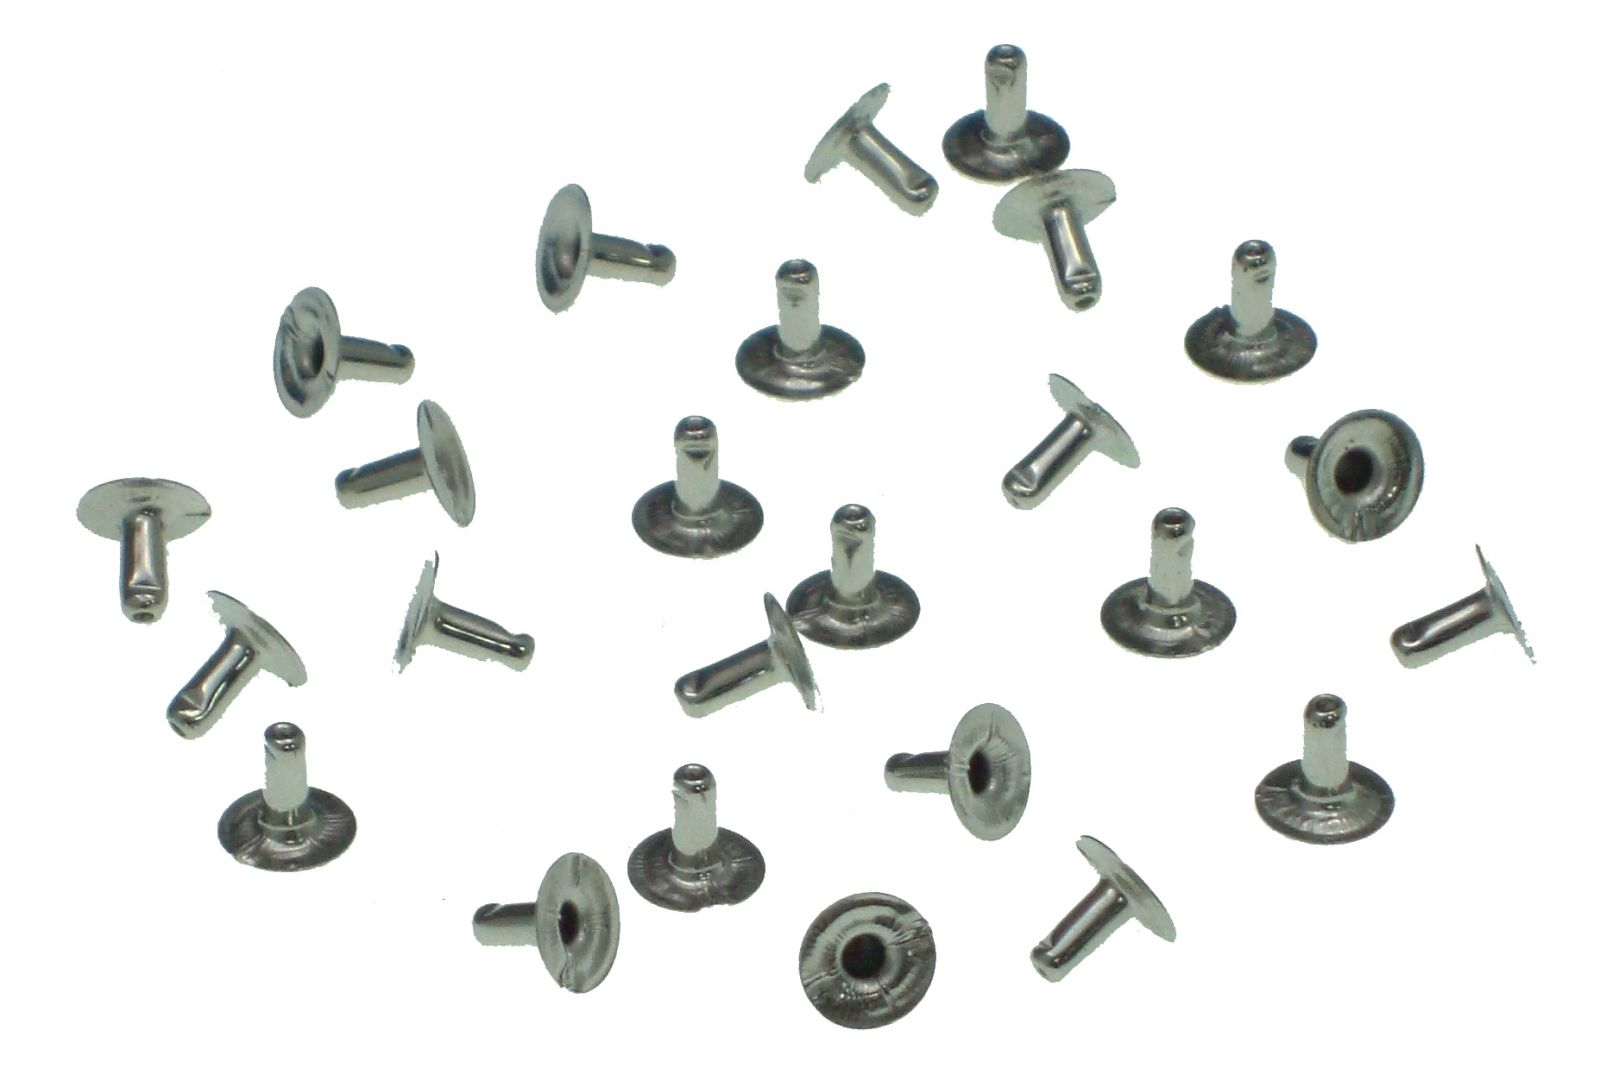 products rivet series collision nail series uff1aying fang